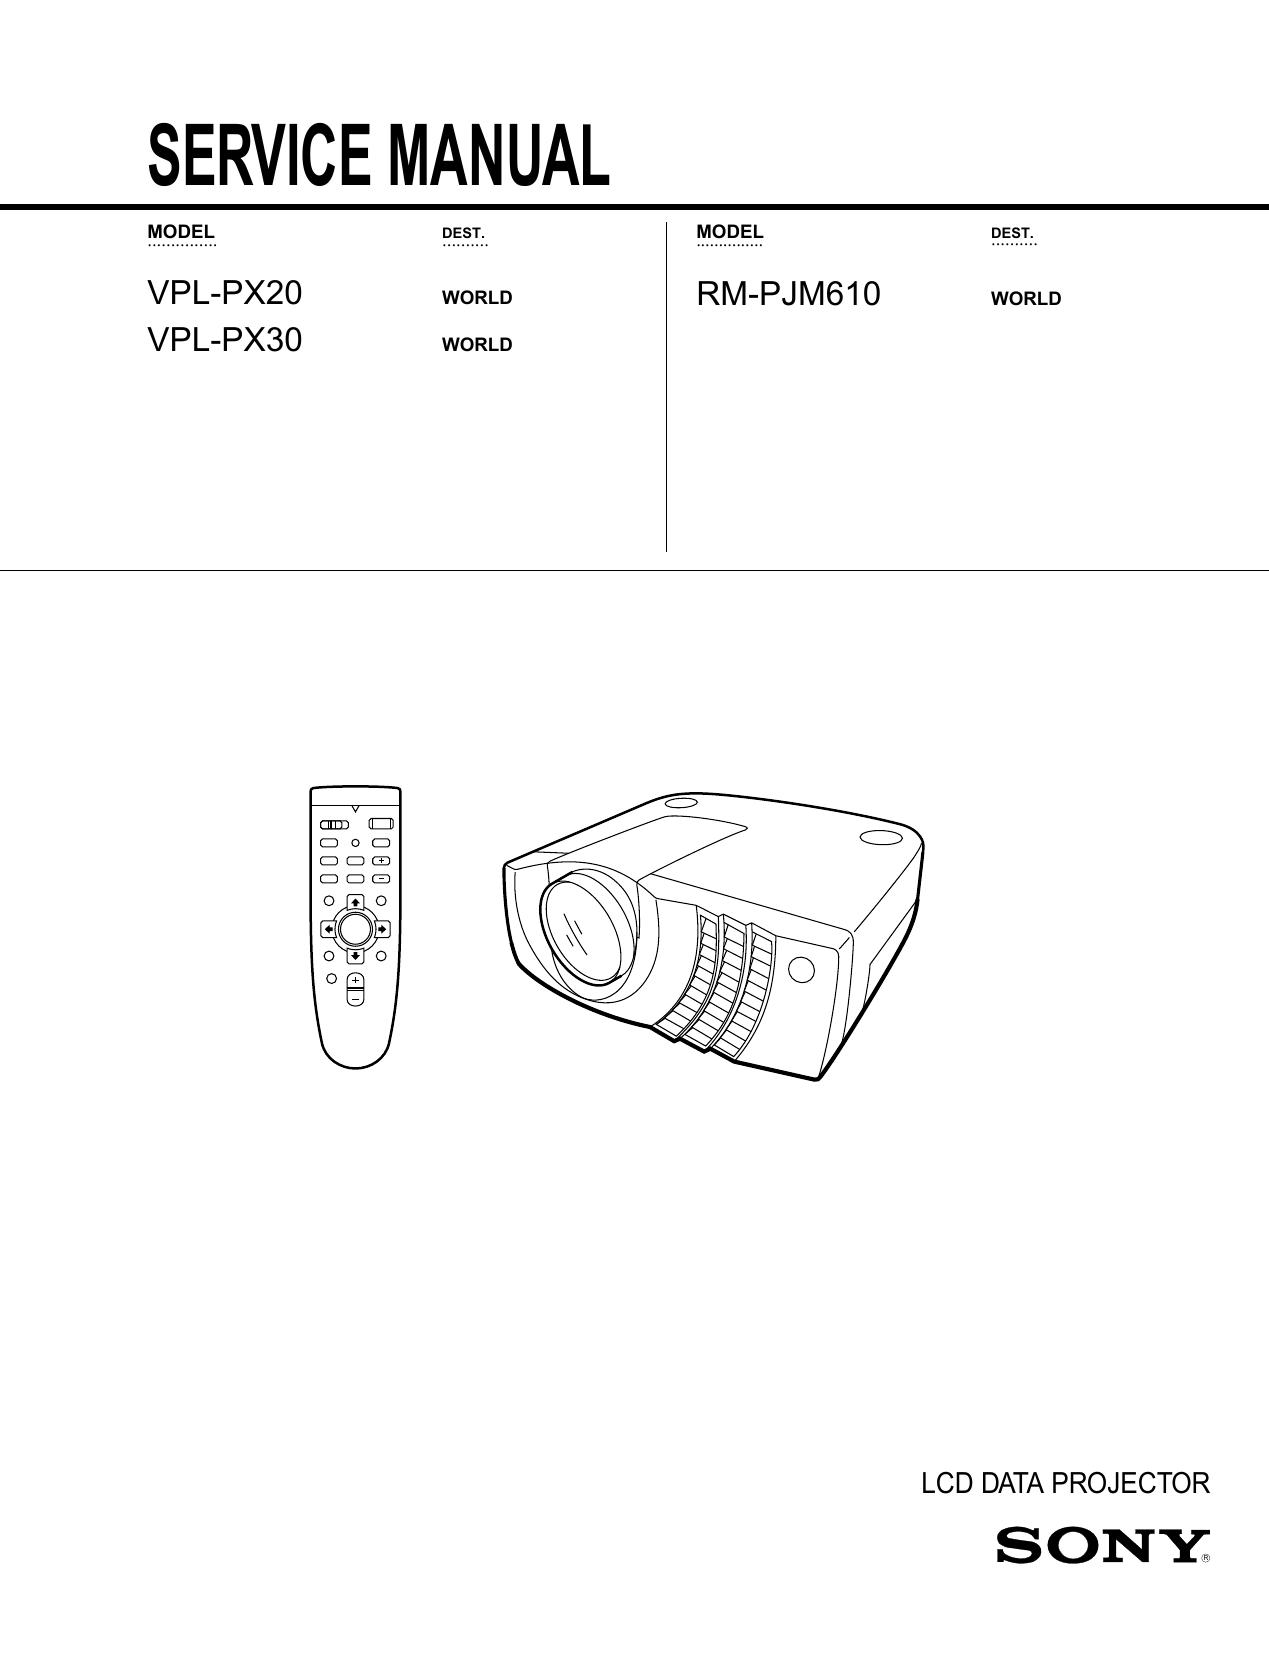 LCD Data Projector | manualzz com